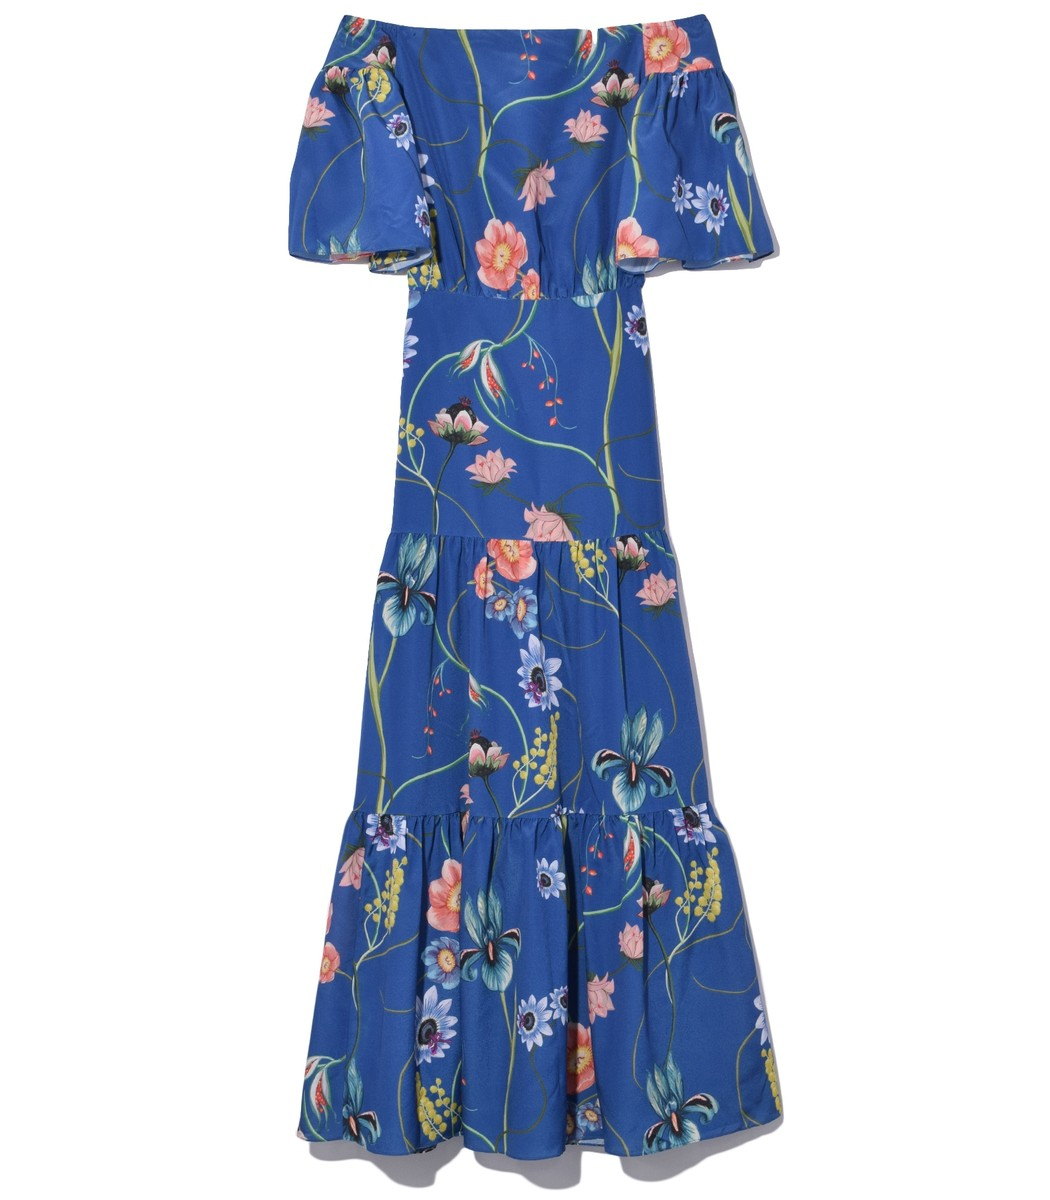 Borgo De Nor Emelia Crepe Dress in Blue